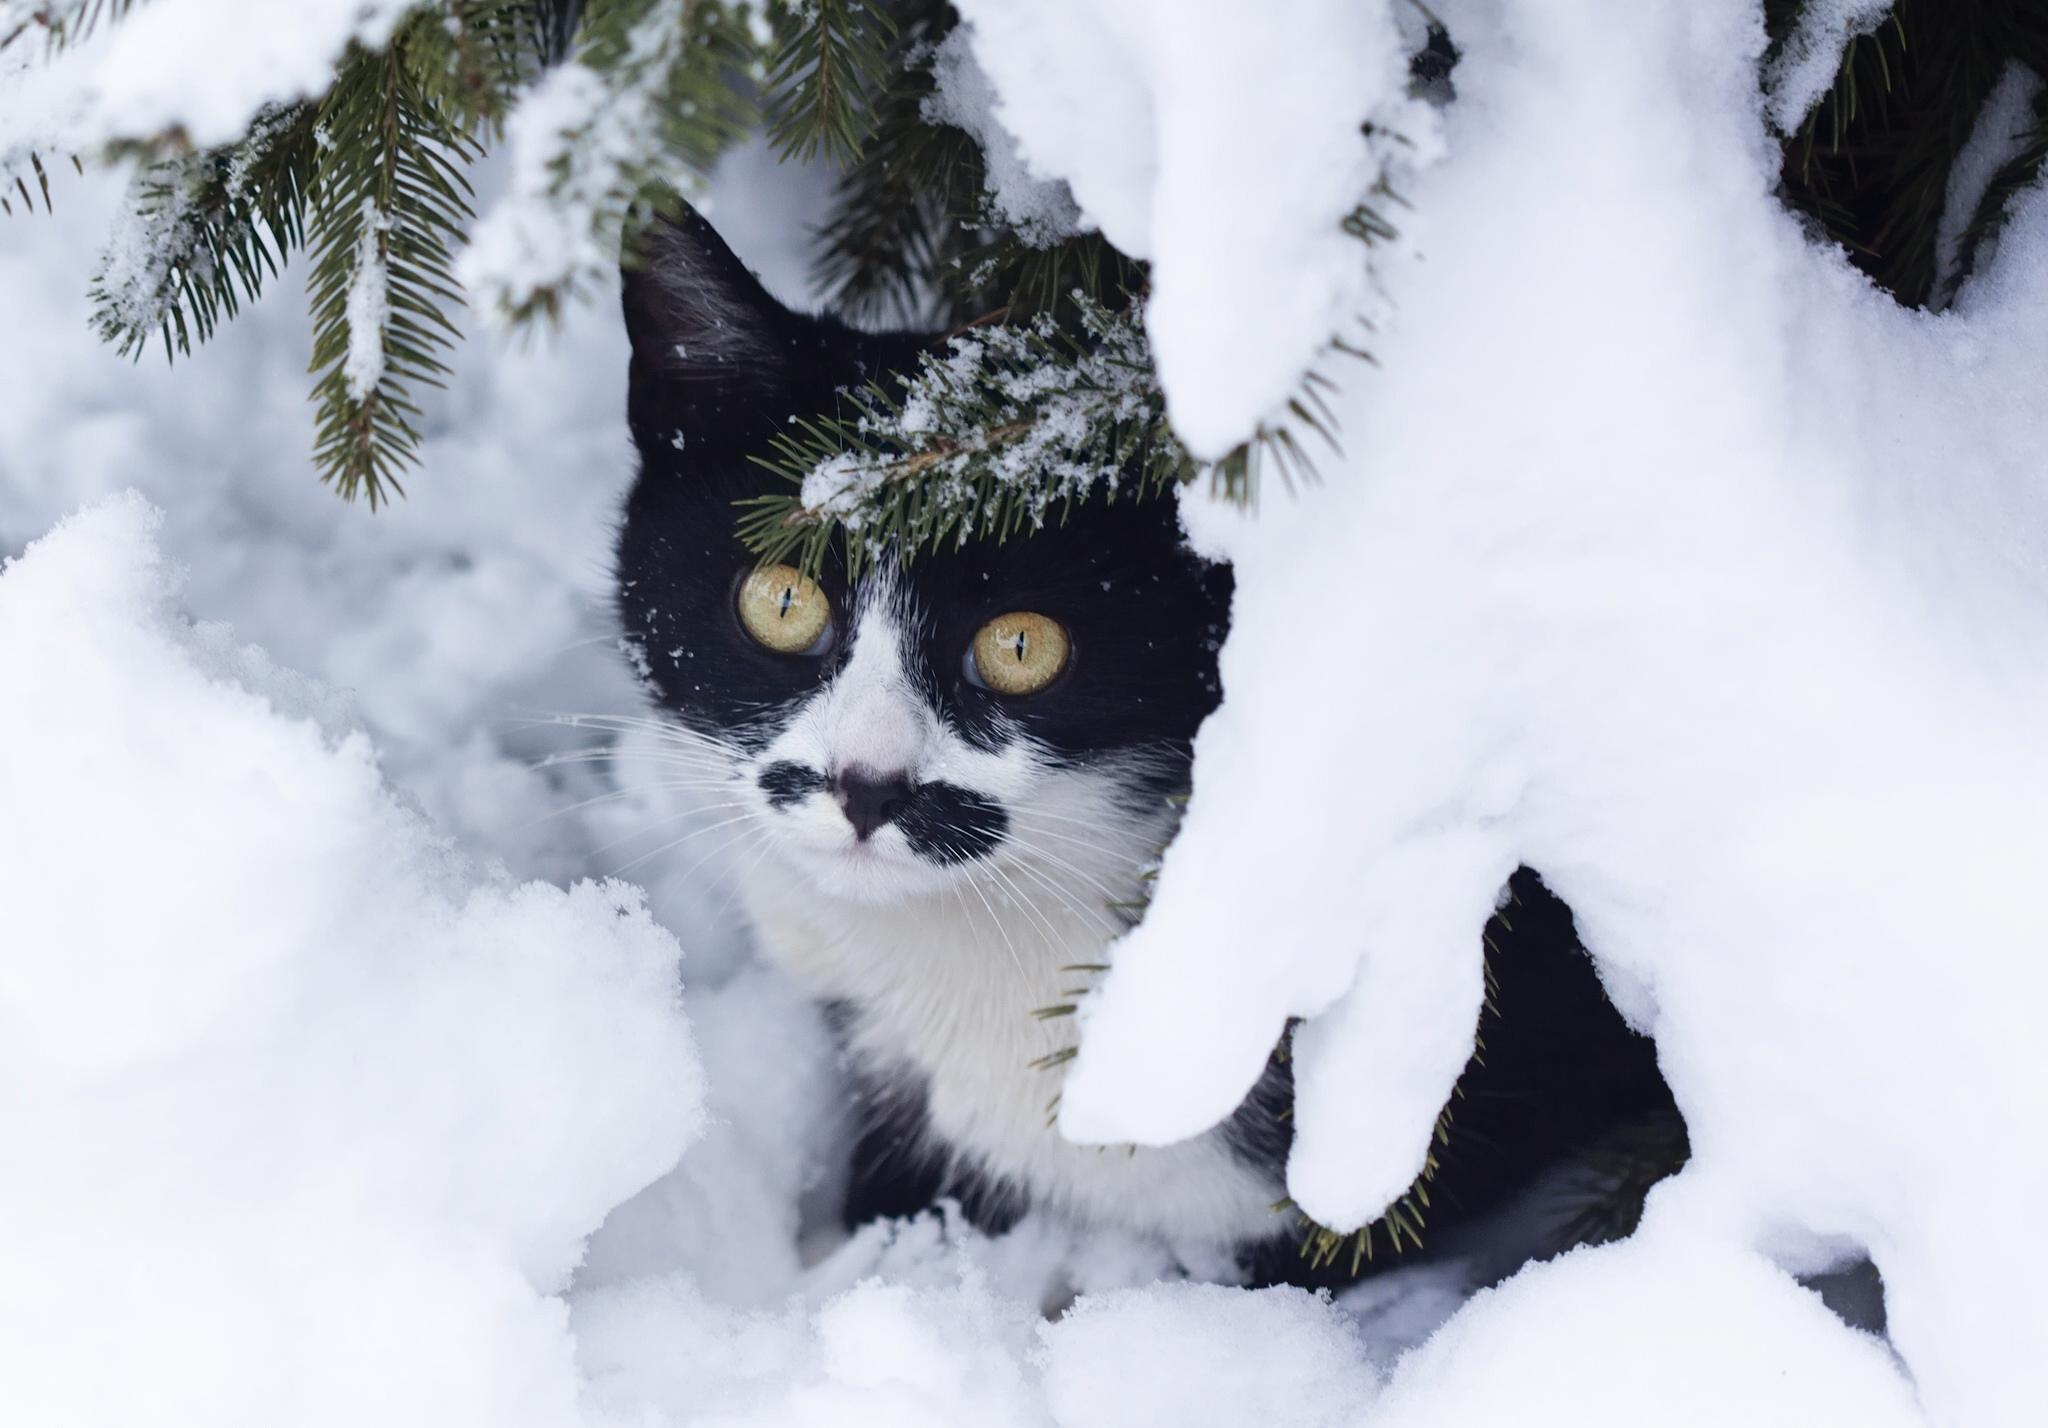 пэкхам картинки на рабочий стол зима котики в снегу дпс